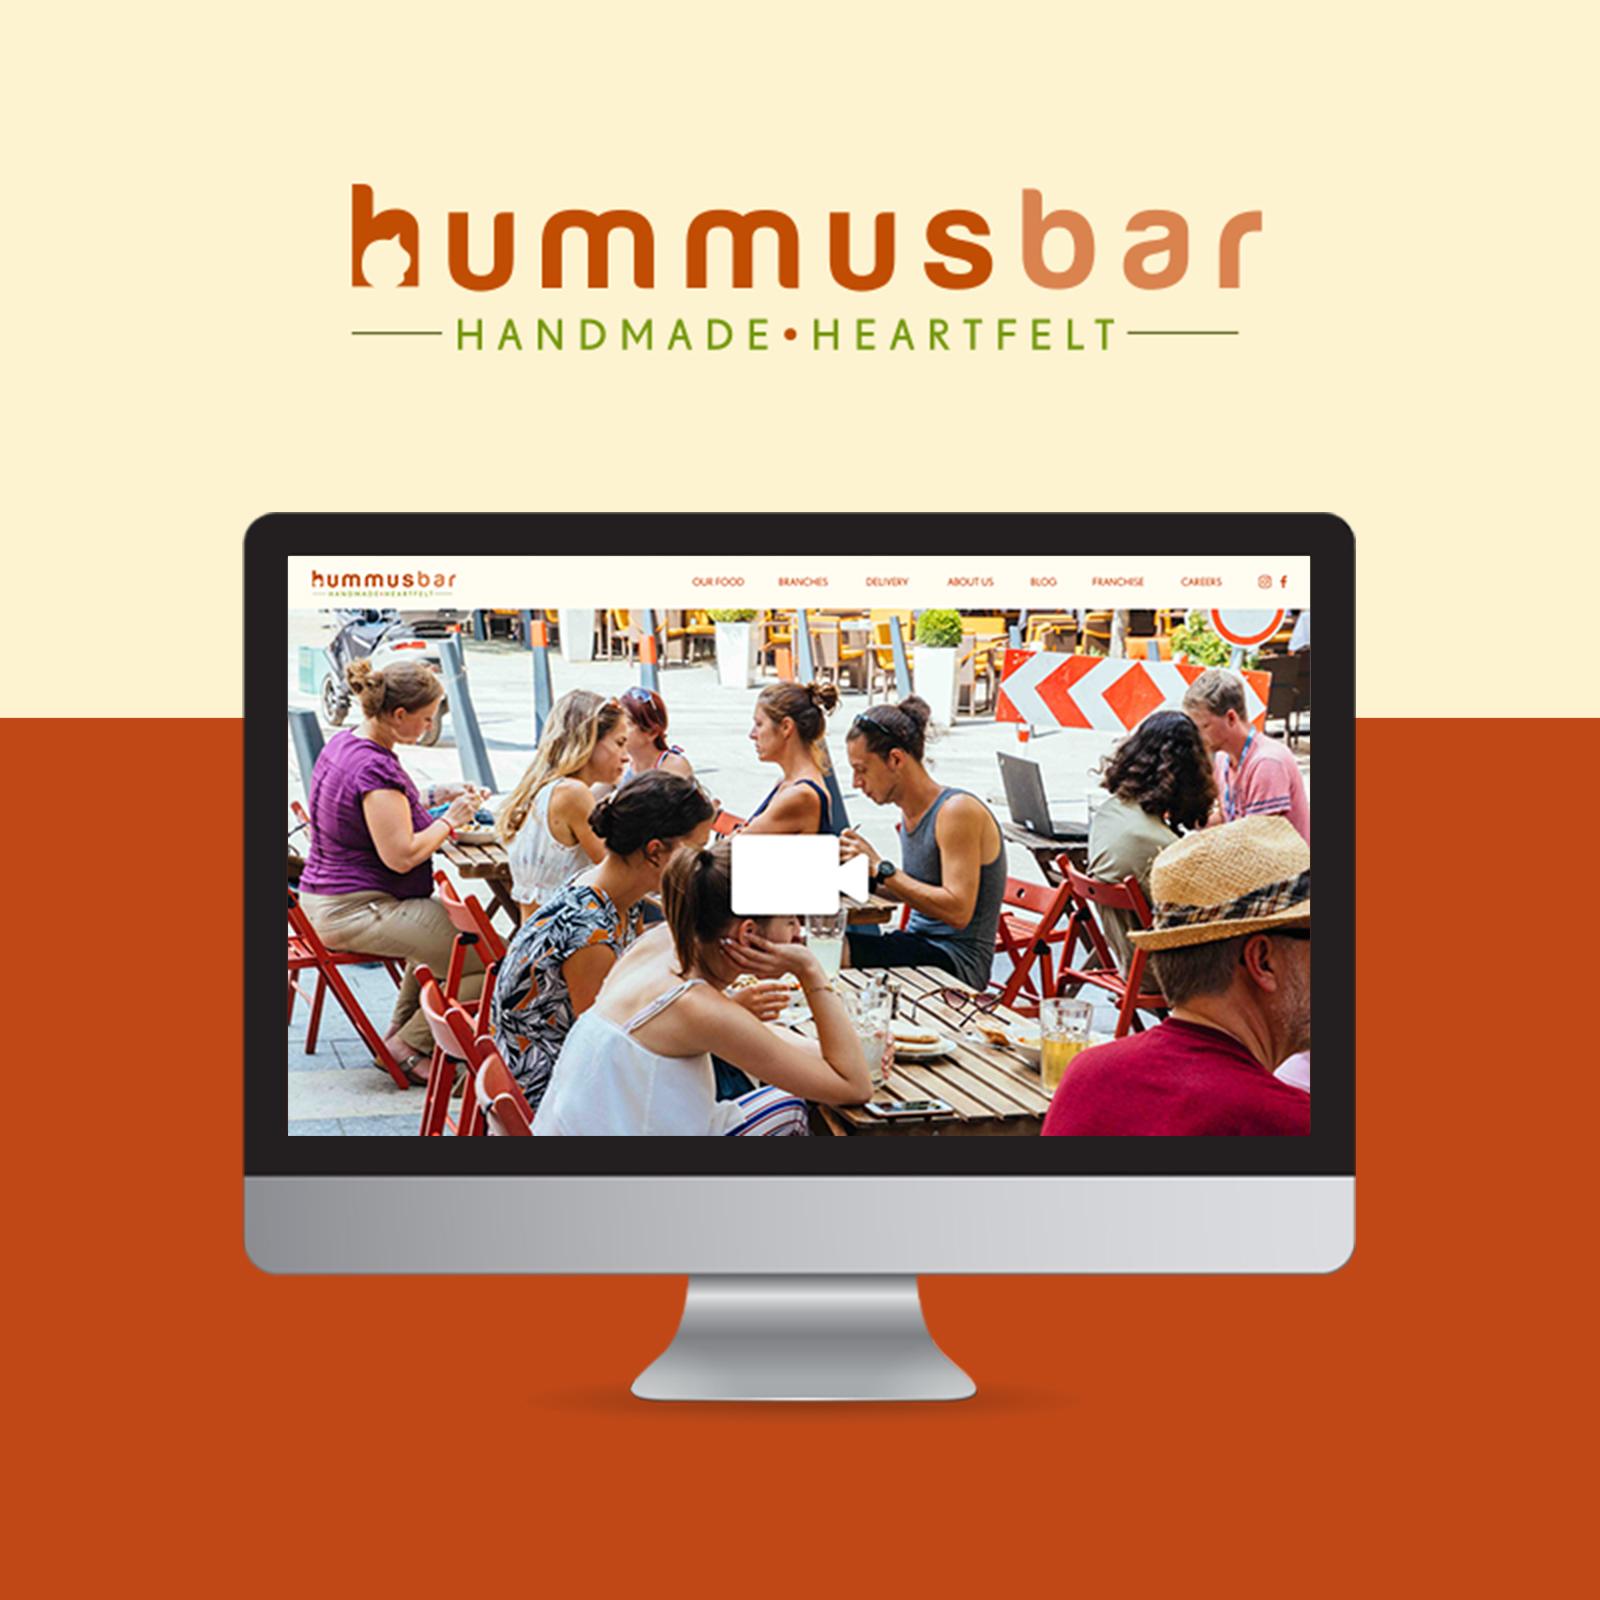 hummusbar